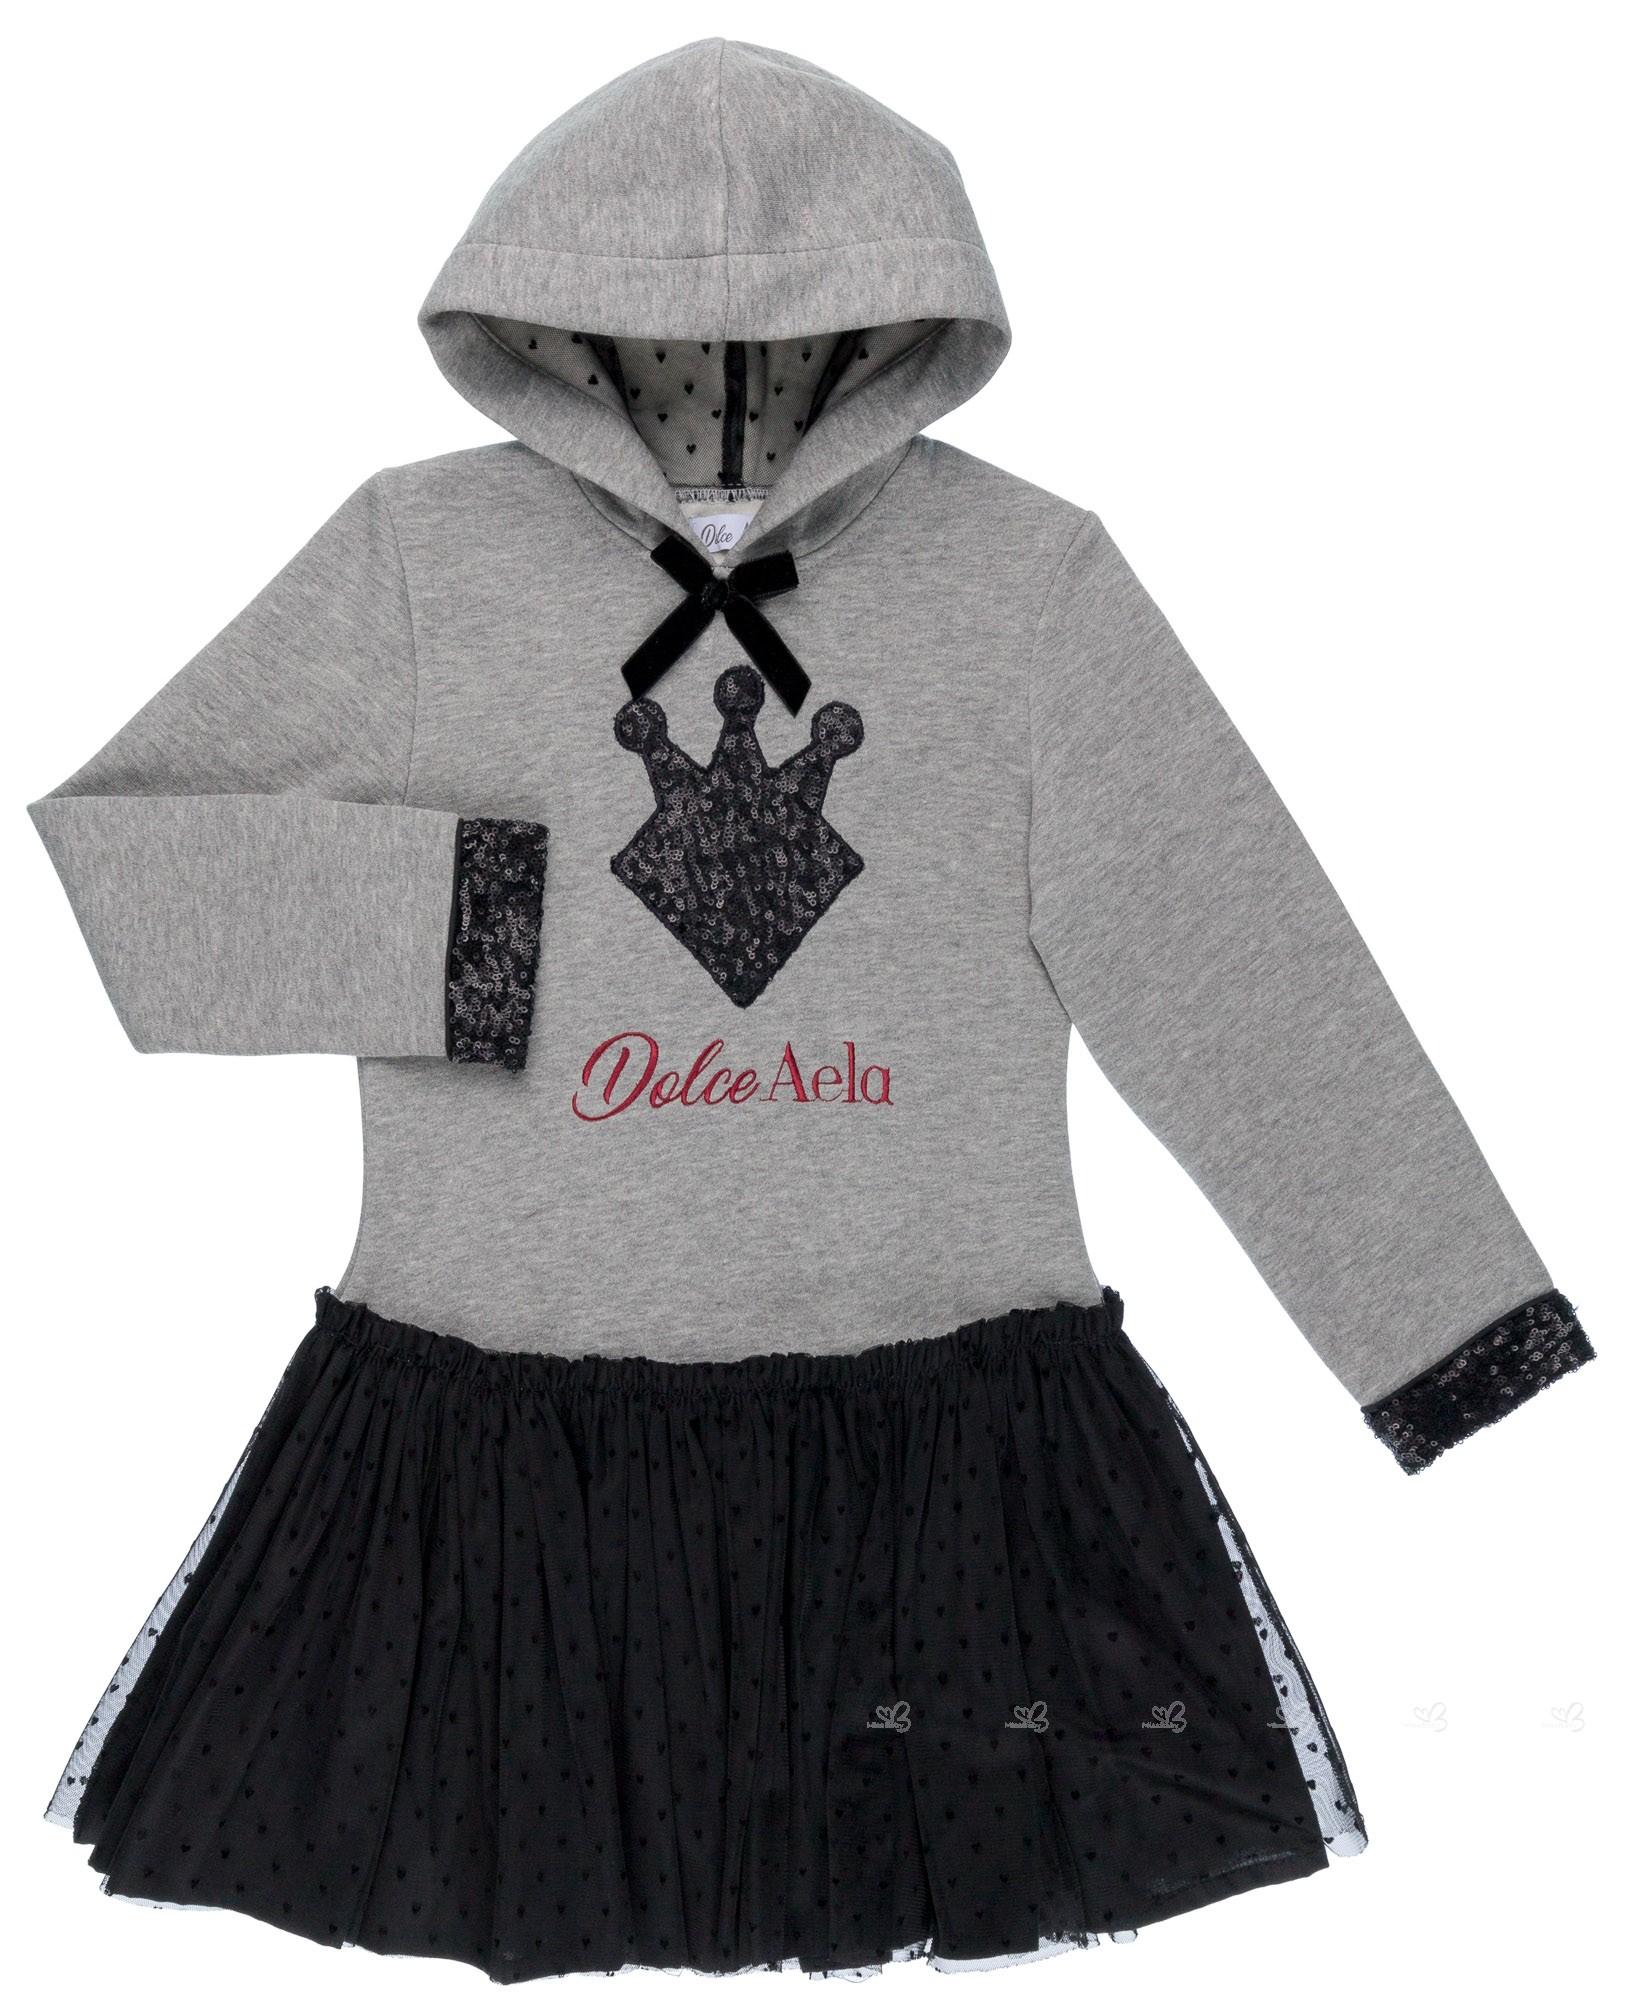 799e020a5 Dolce Petit Vestido Niña Cuerpo Sudadera Capucha Gris   Falda Tul Corazones  Negro ...